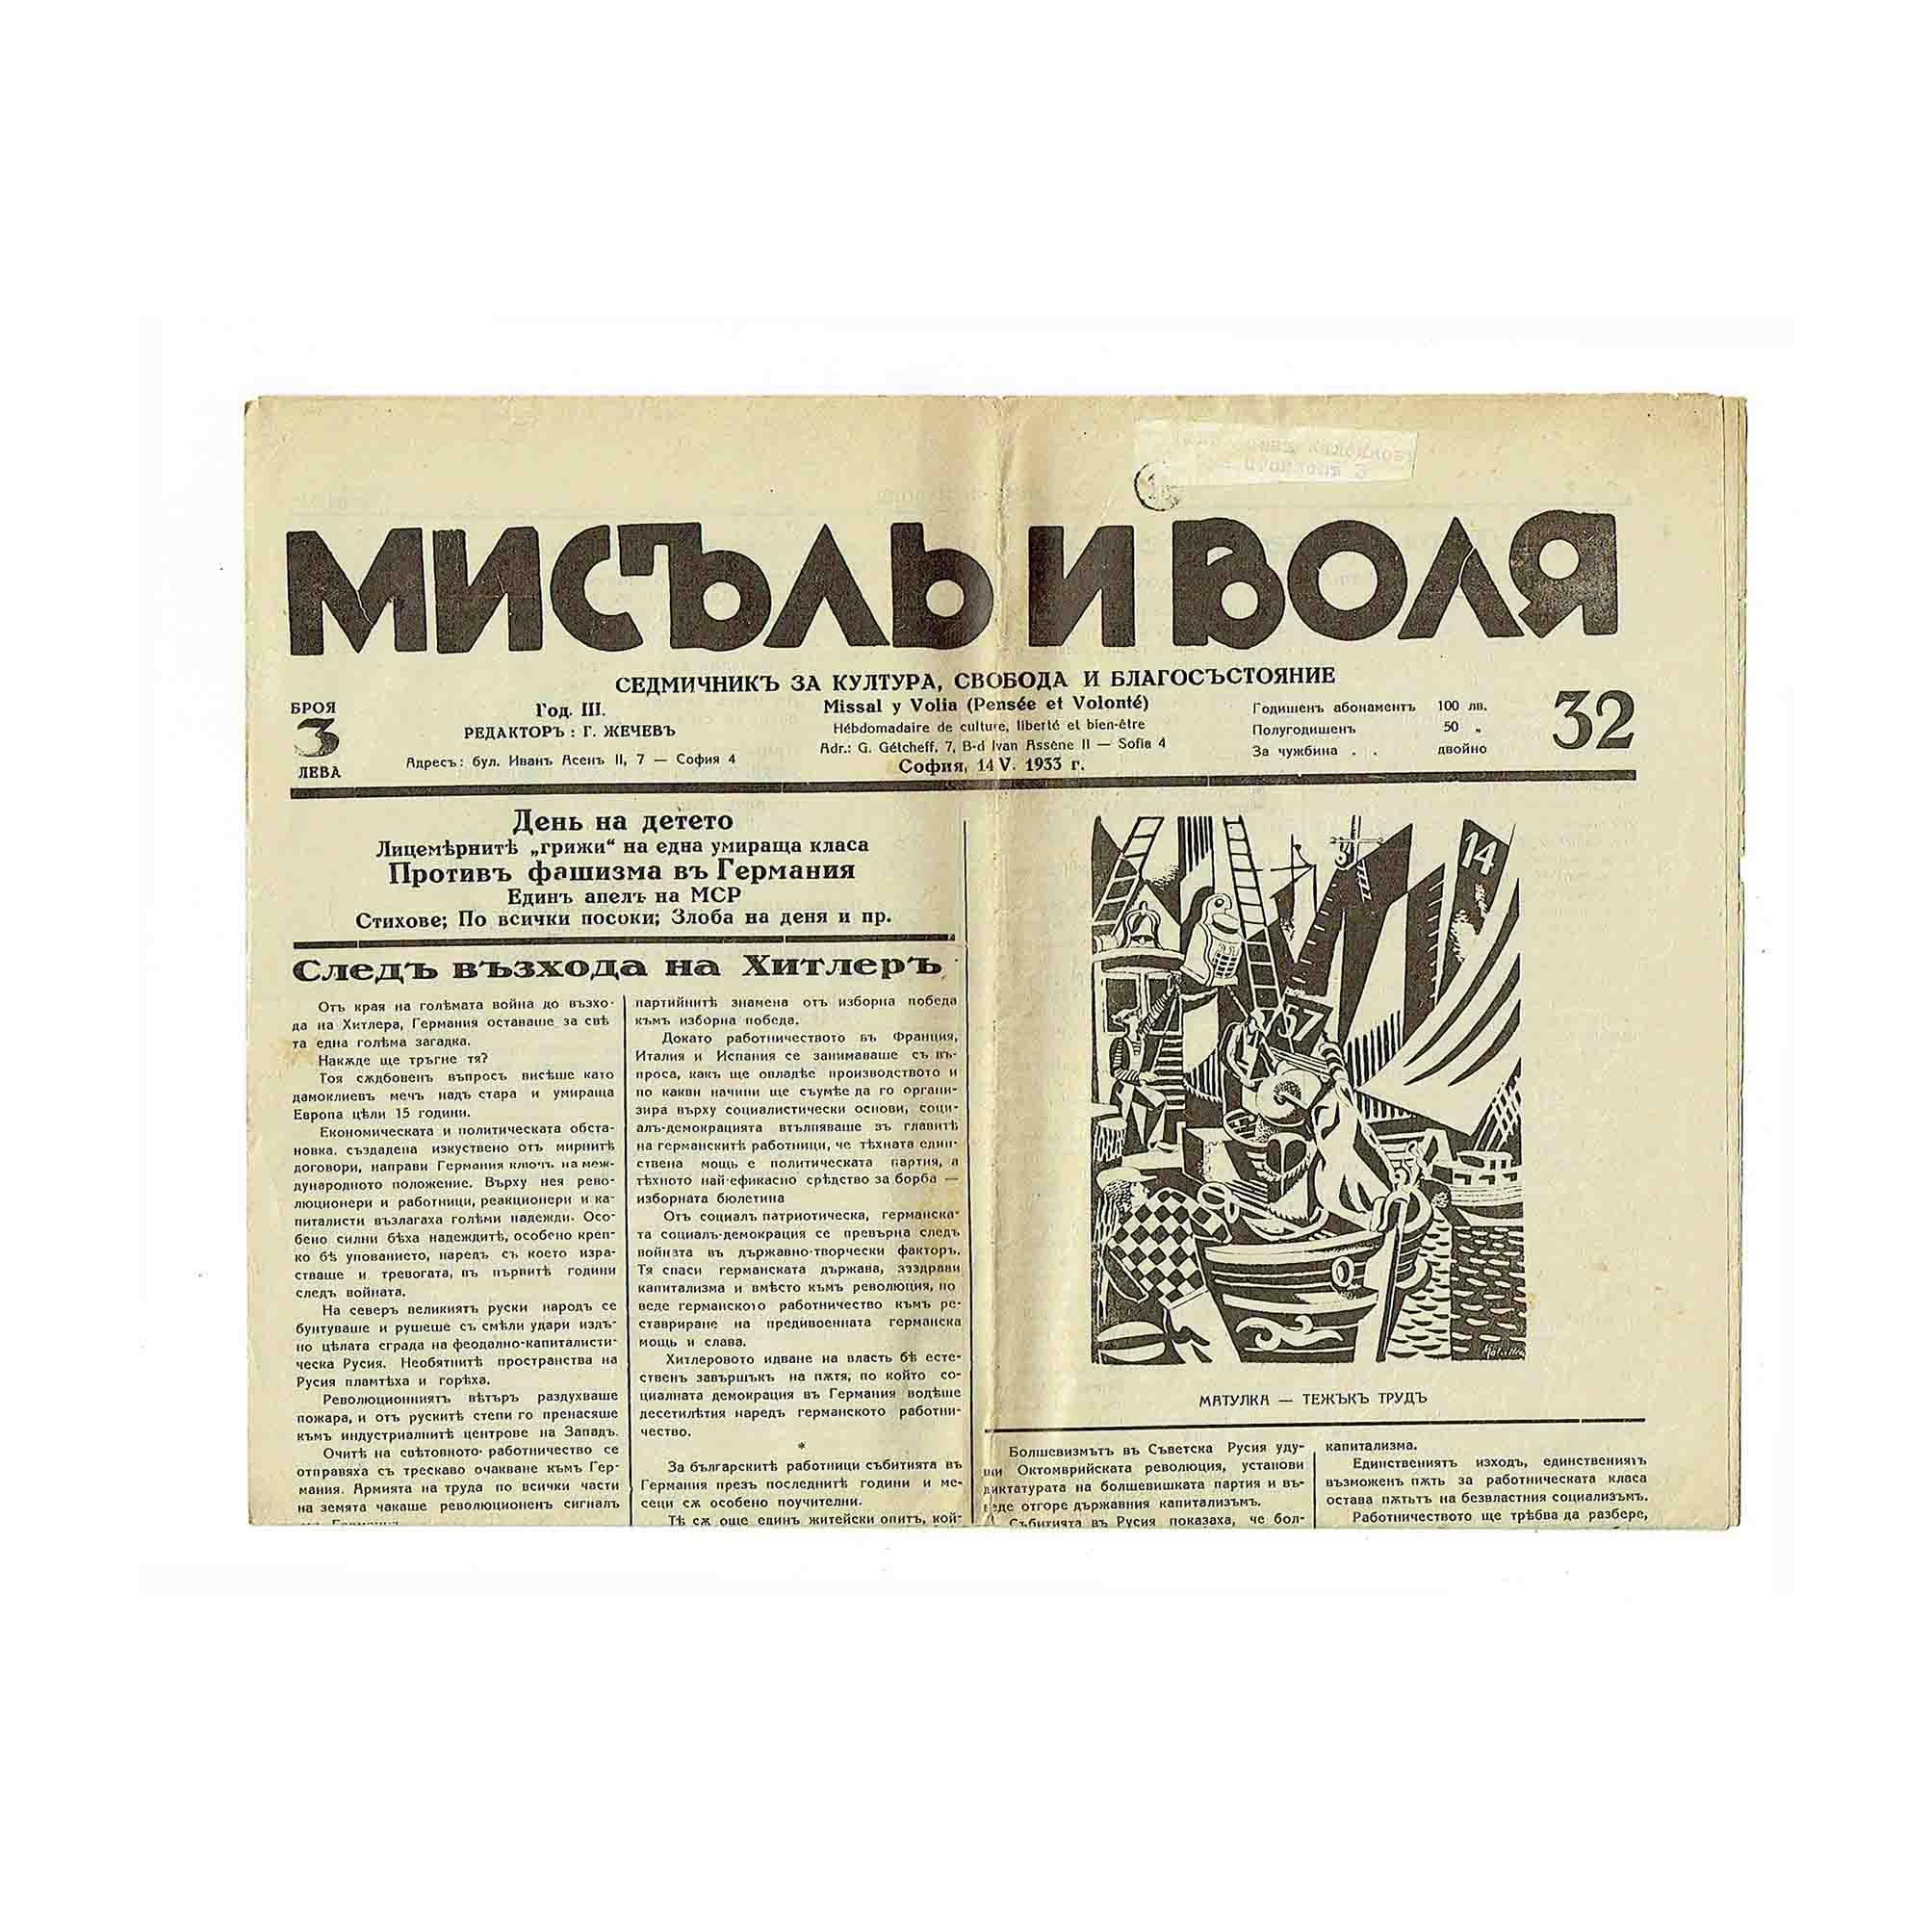 5851 Misal i Volya Gedanke und Wille III 35 1933 Jan Matulka Titelblatt frei N